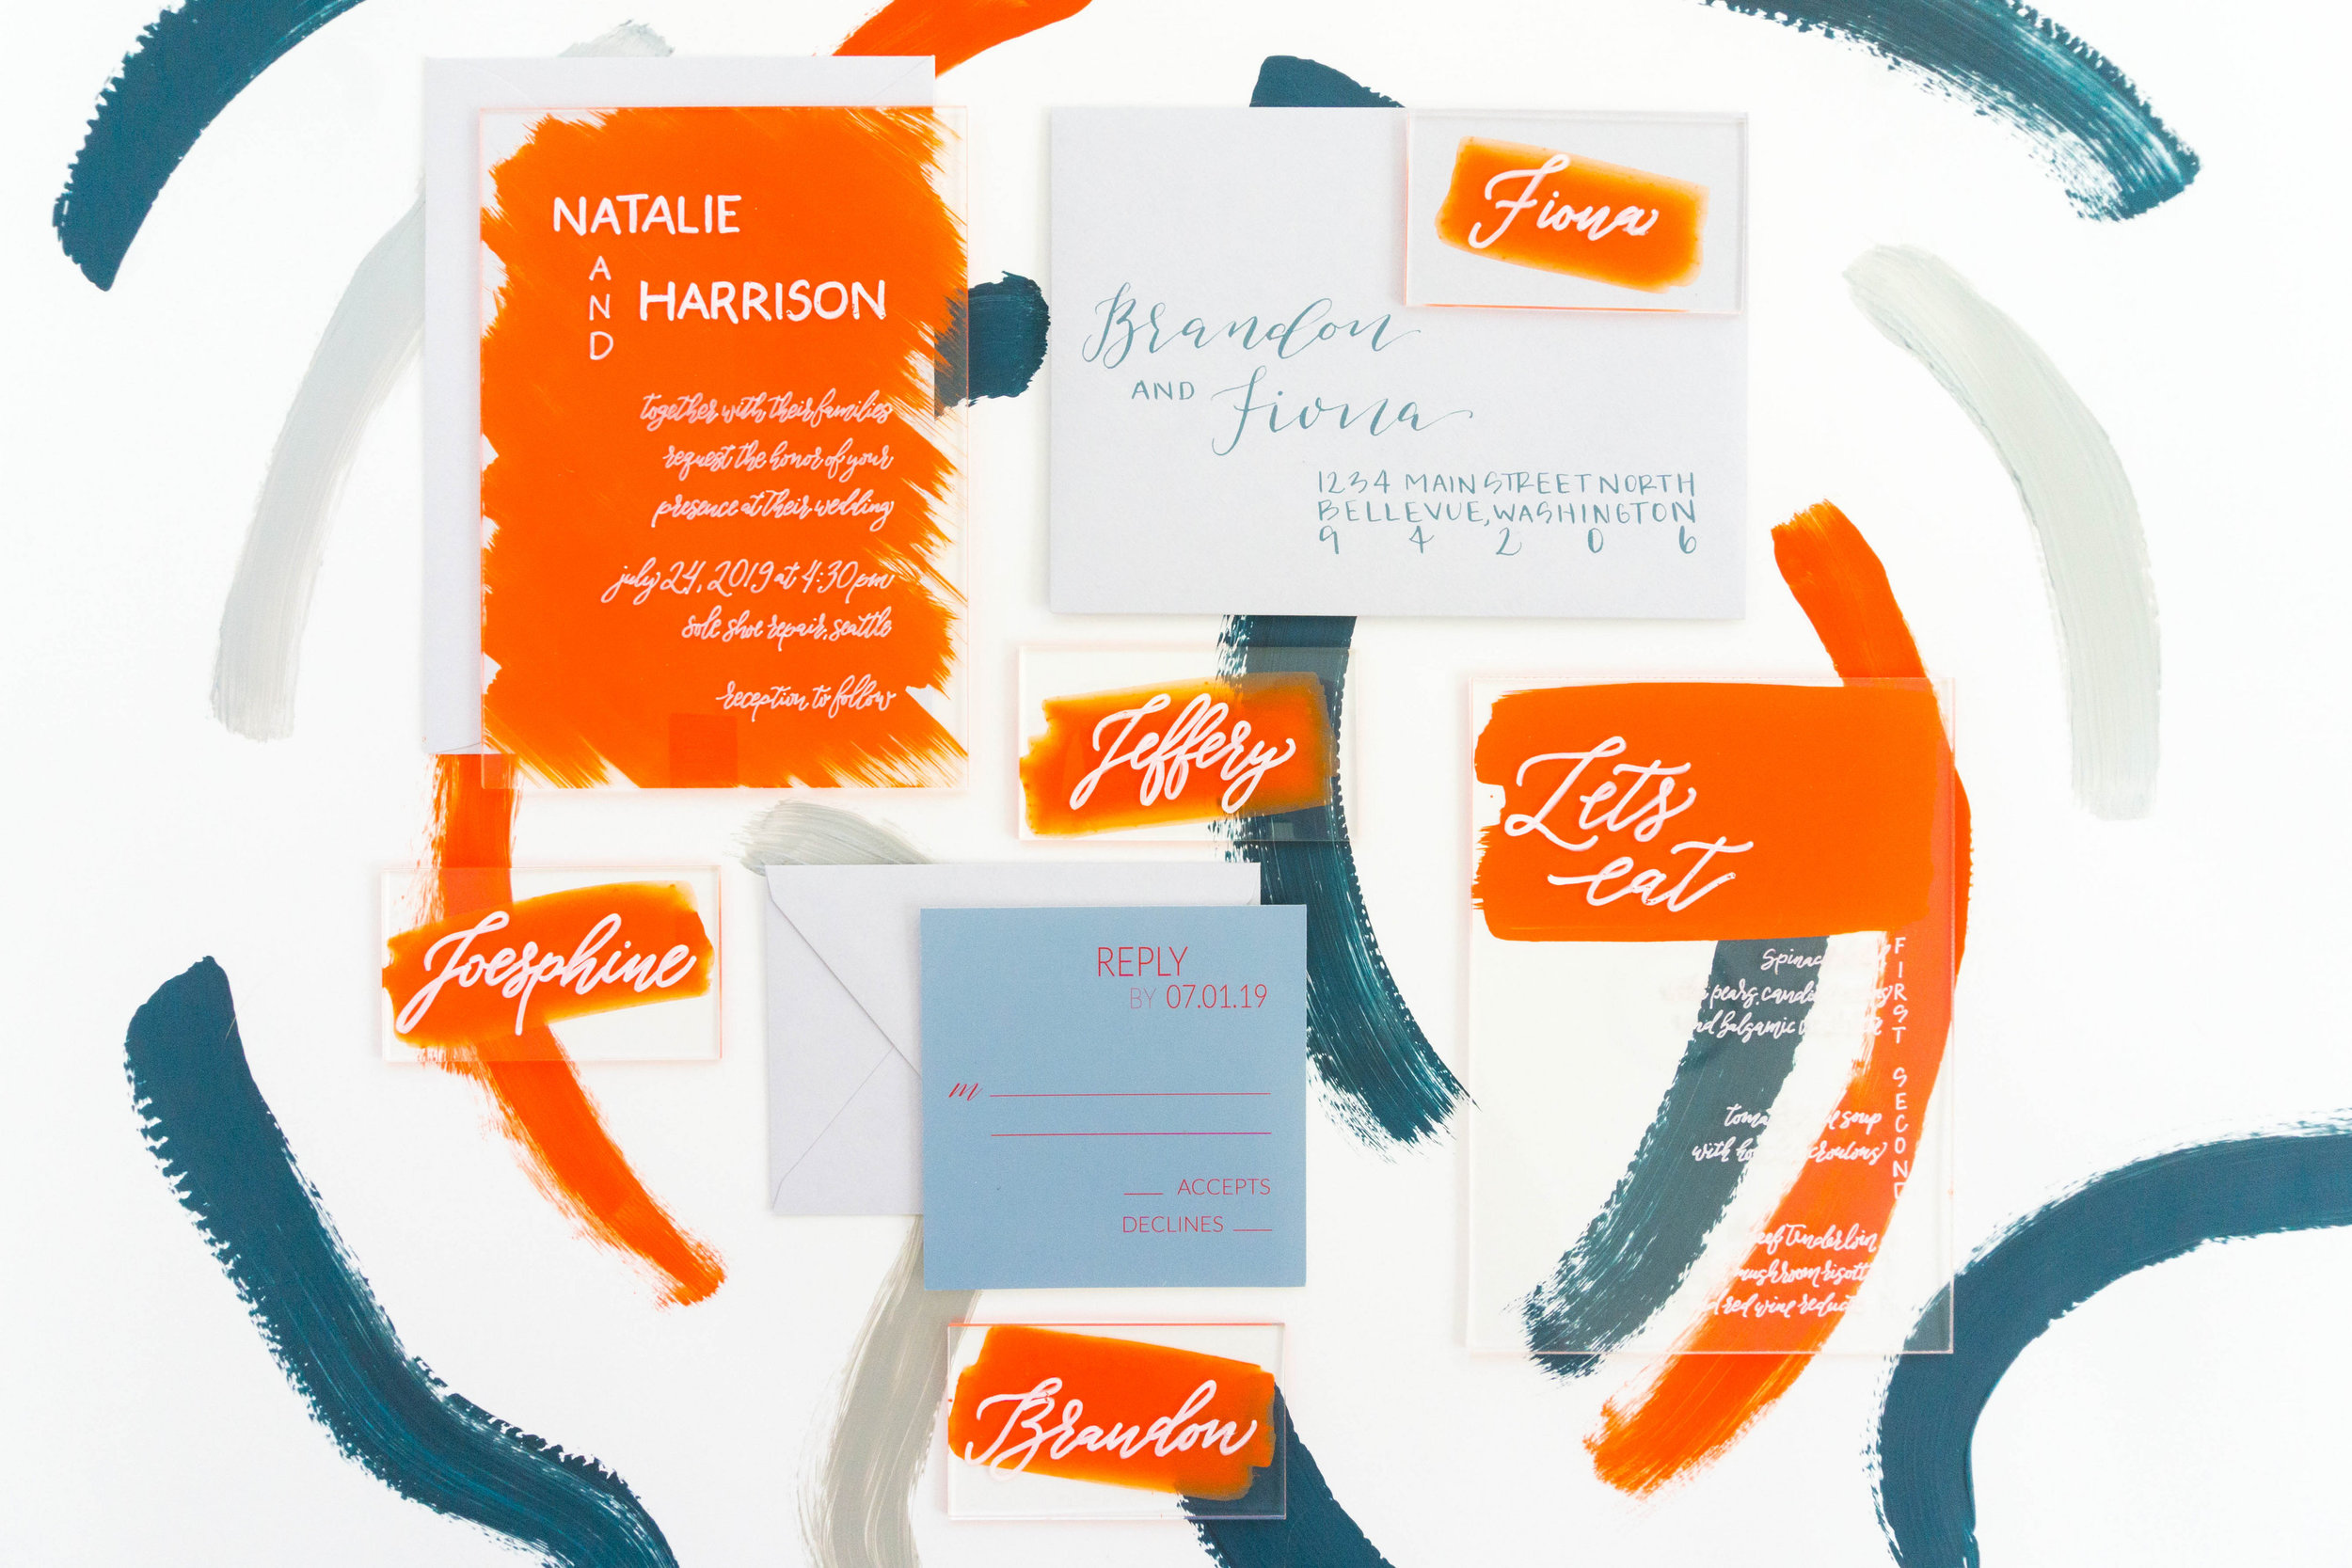 love-fern-design-studio-custom-wedding-invitations-for-the-modern-couple-modern-calligraphy-in-seattle-washington-custom-wedding-stationery-orange-acrylic-invitation-suite-acrylic-menu